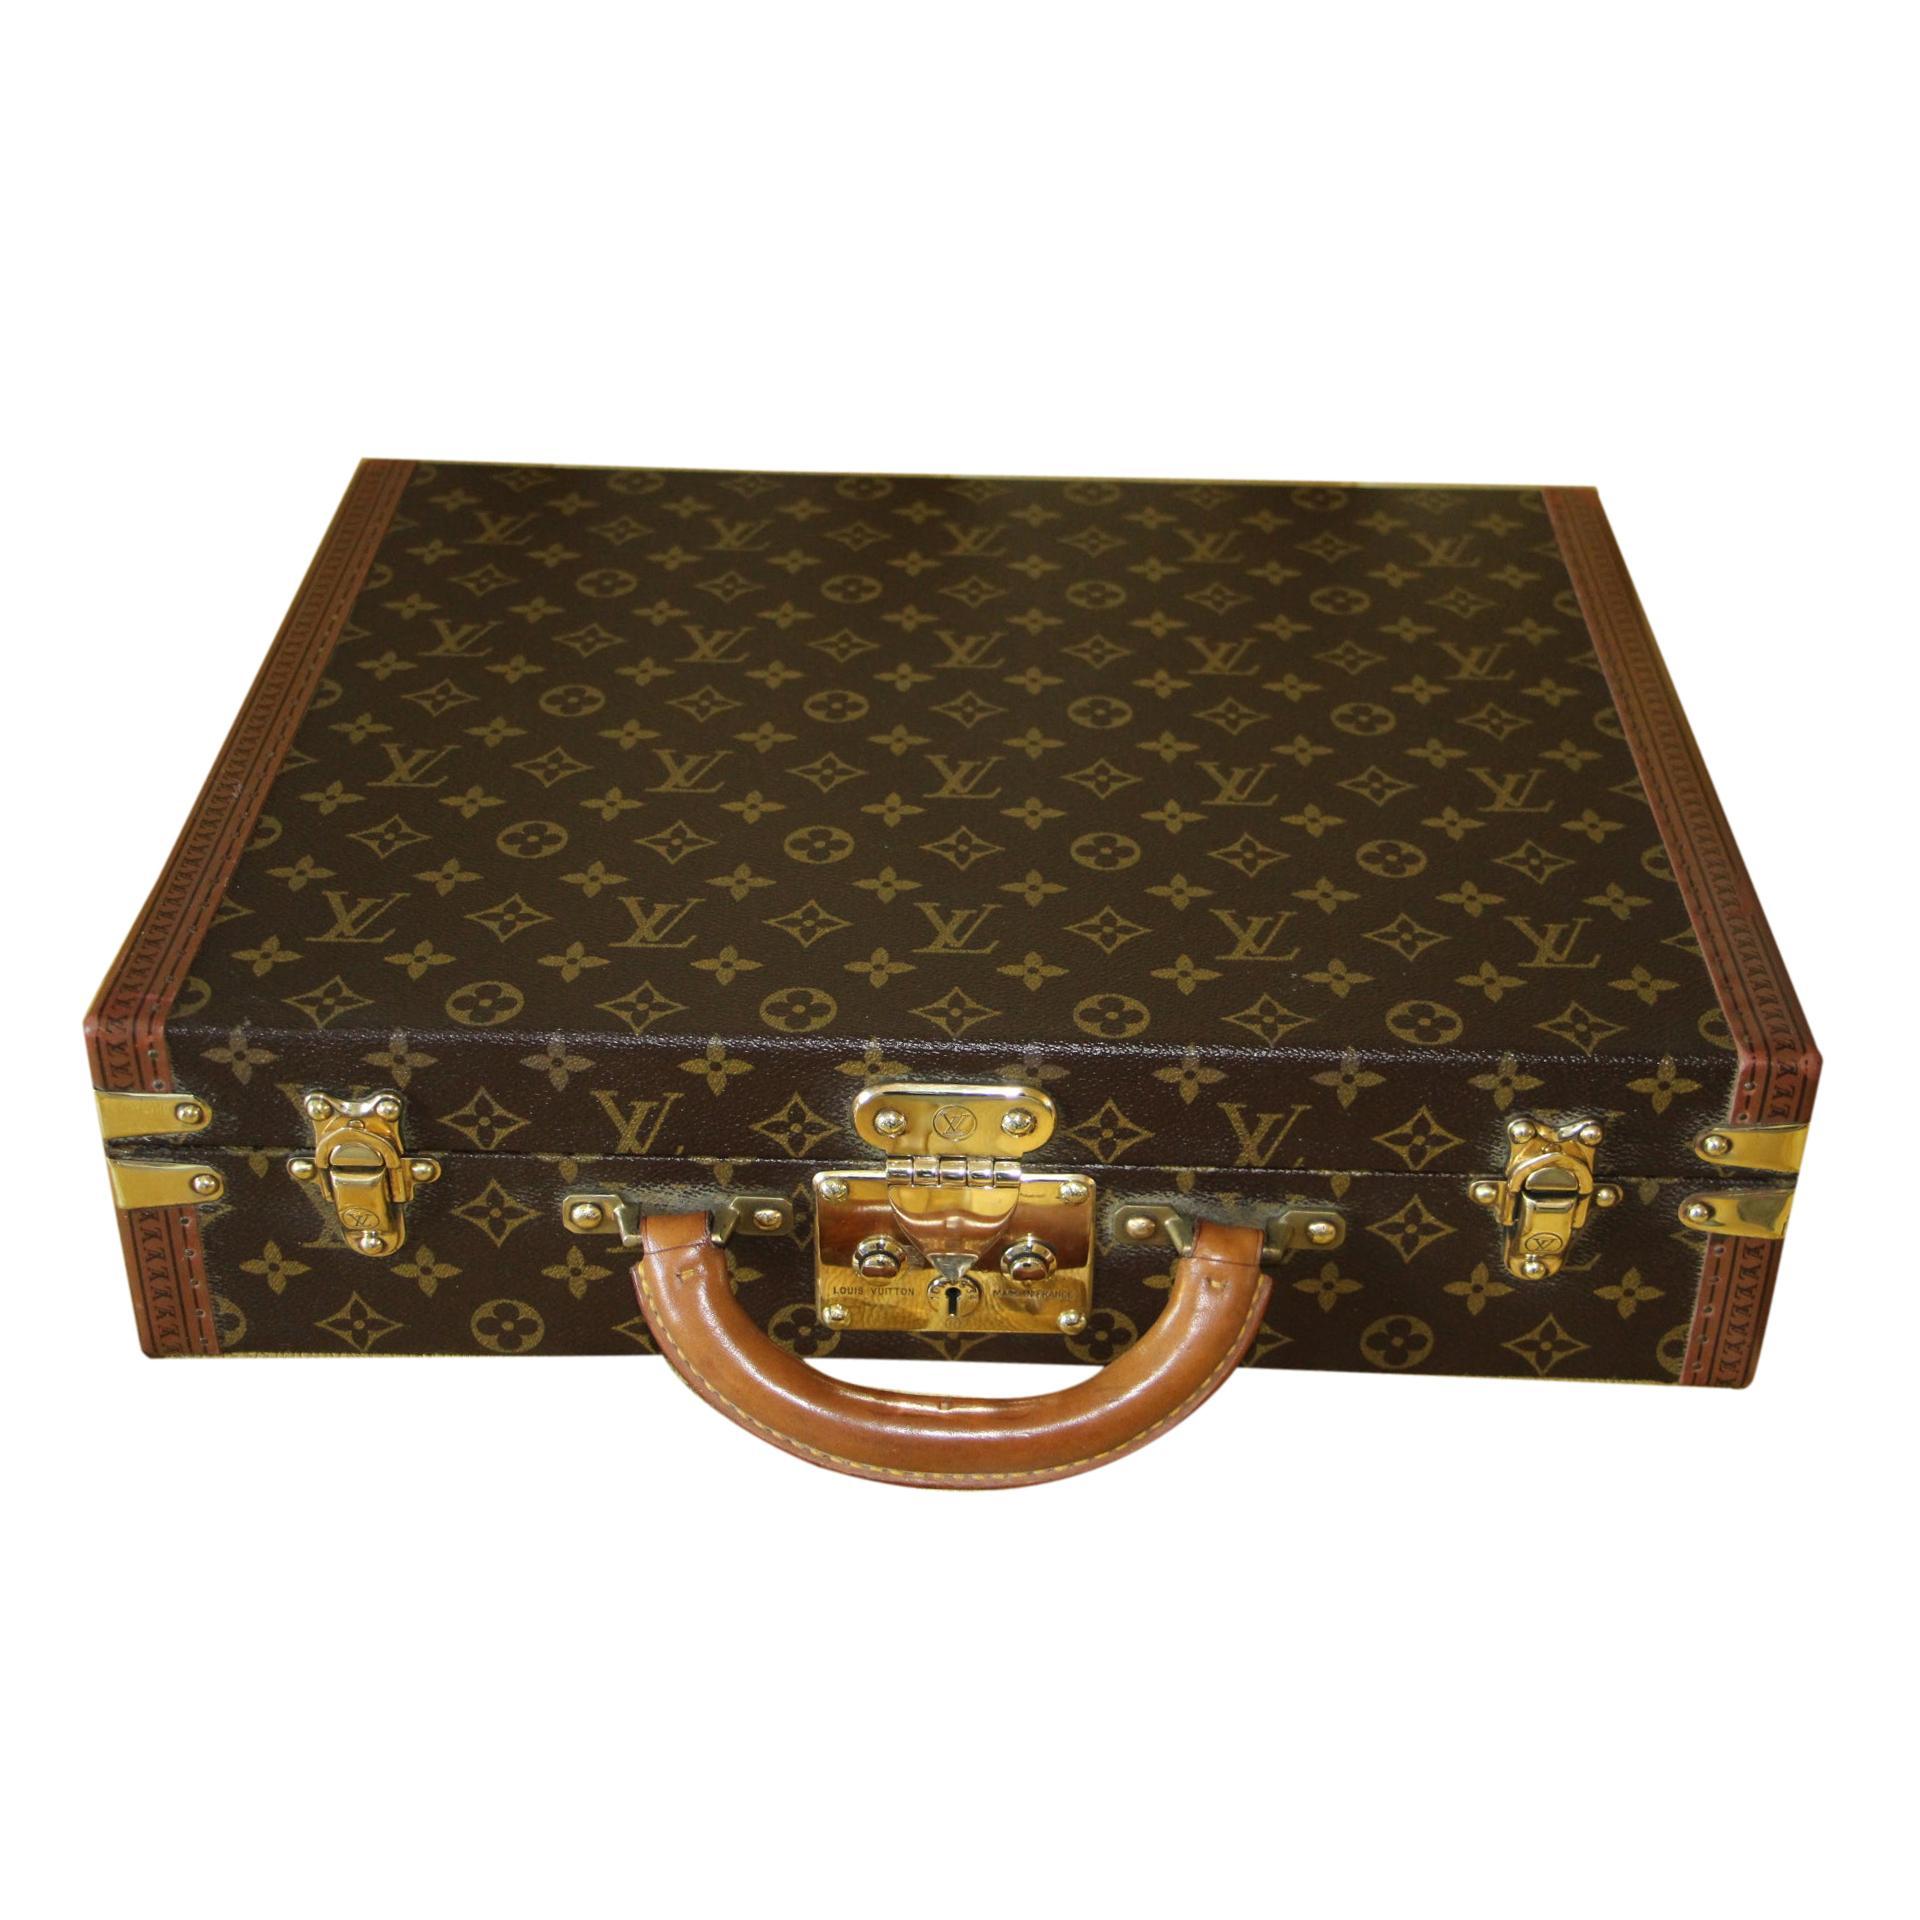 Louis Vuitton Monogramm Briefcase, Louis Vuitton President Case